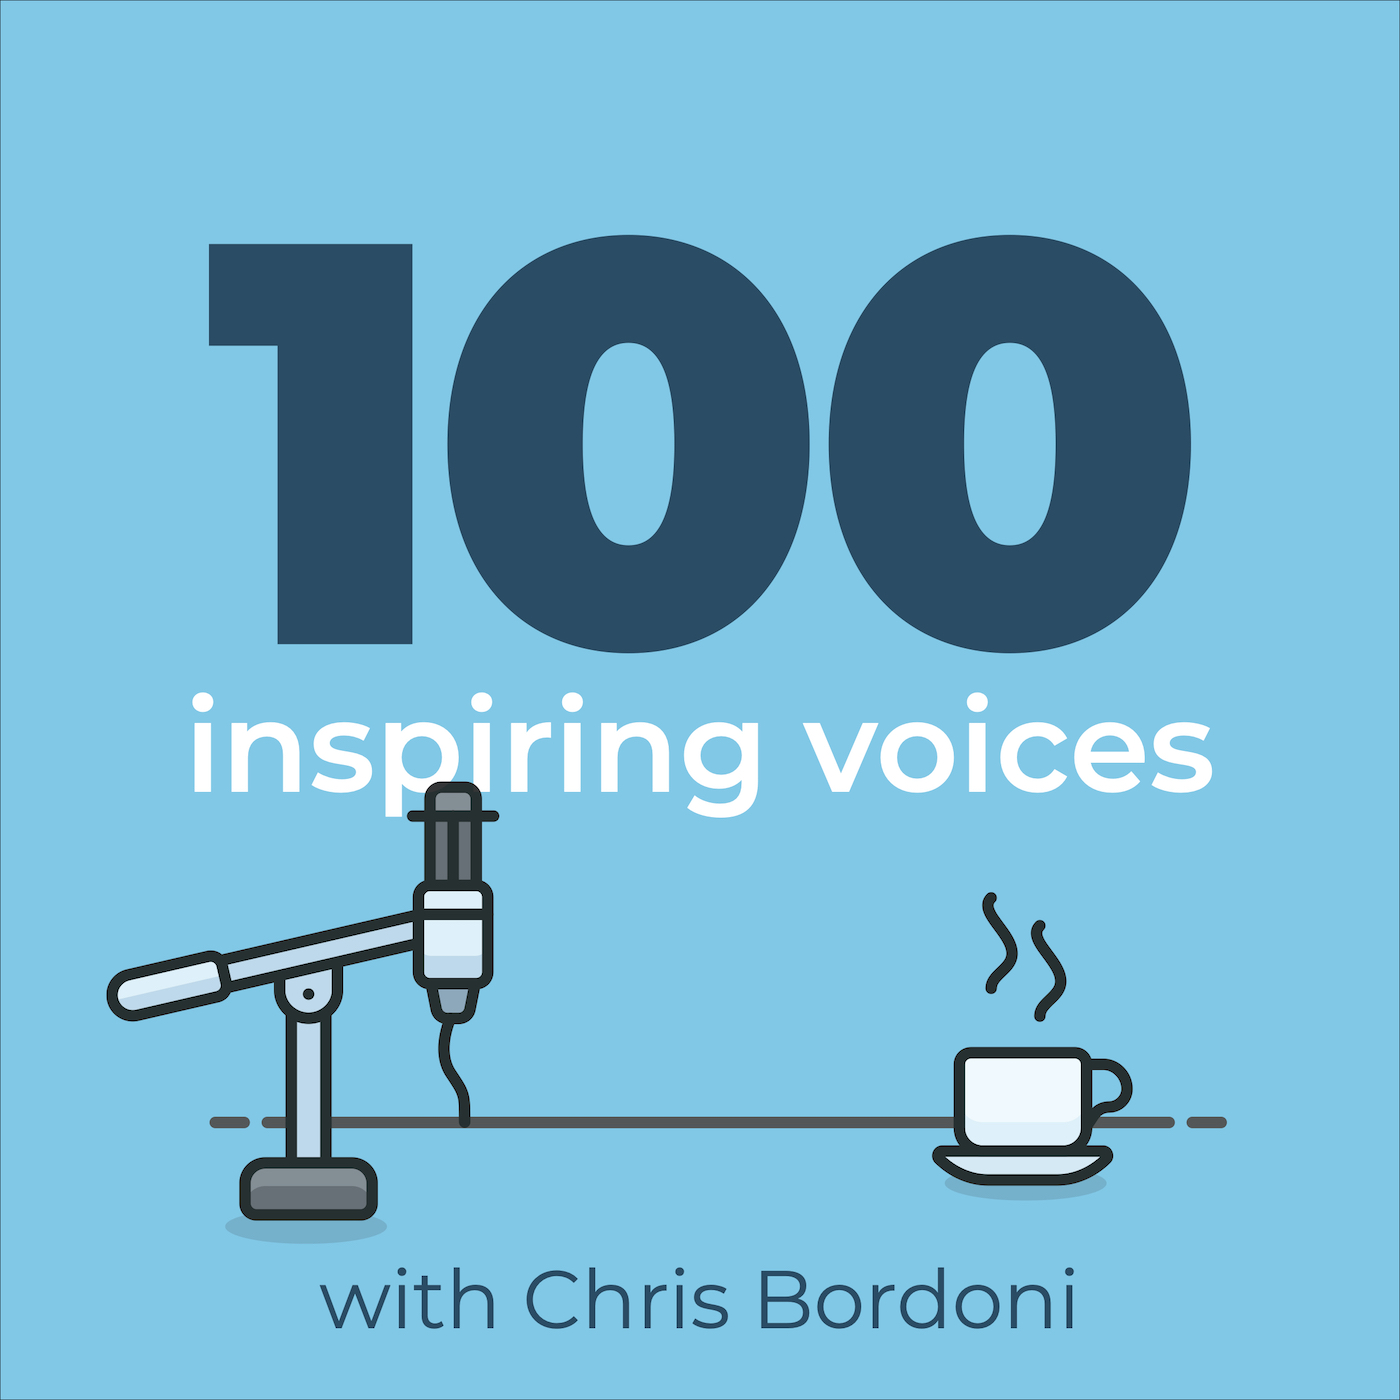 100 Inspiring Voices with Chris Bordoni